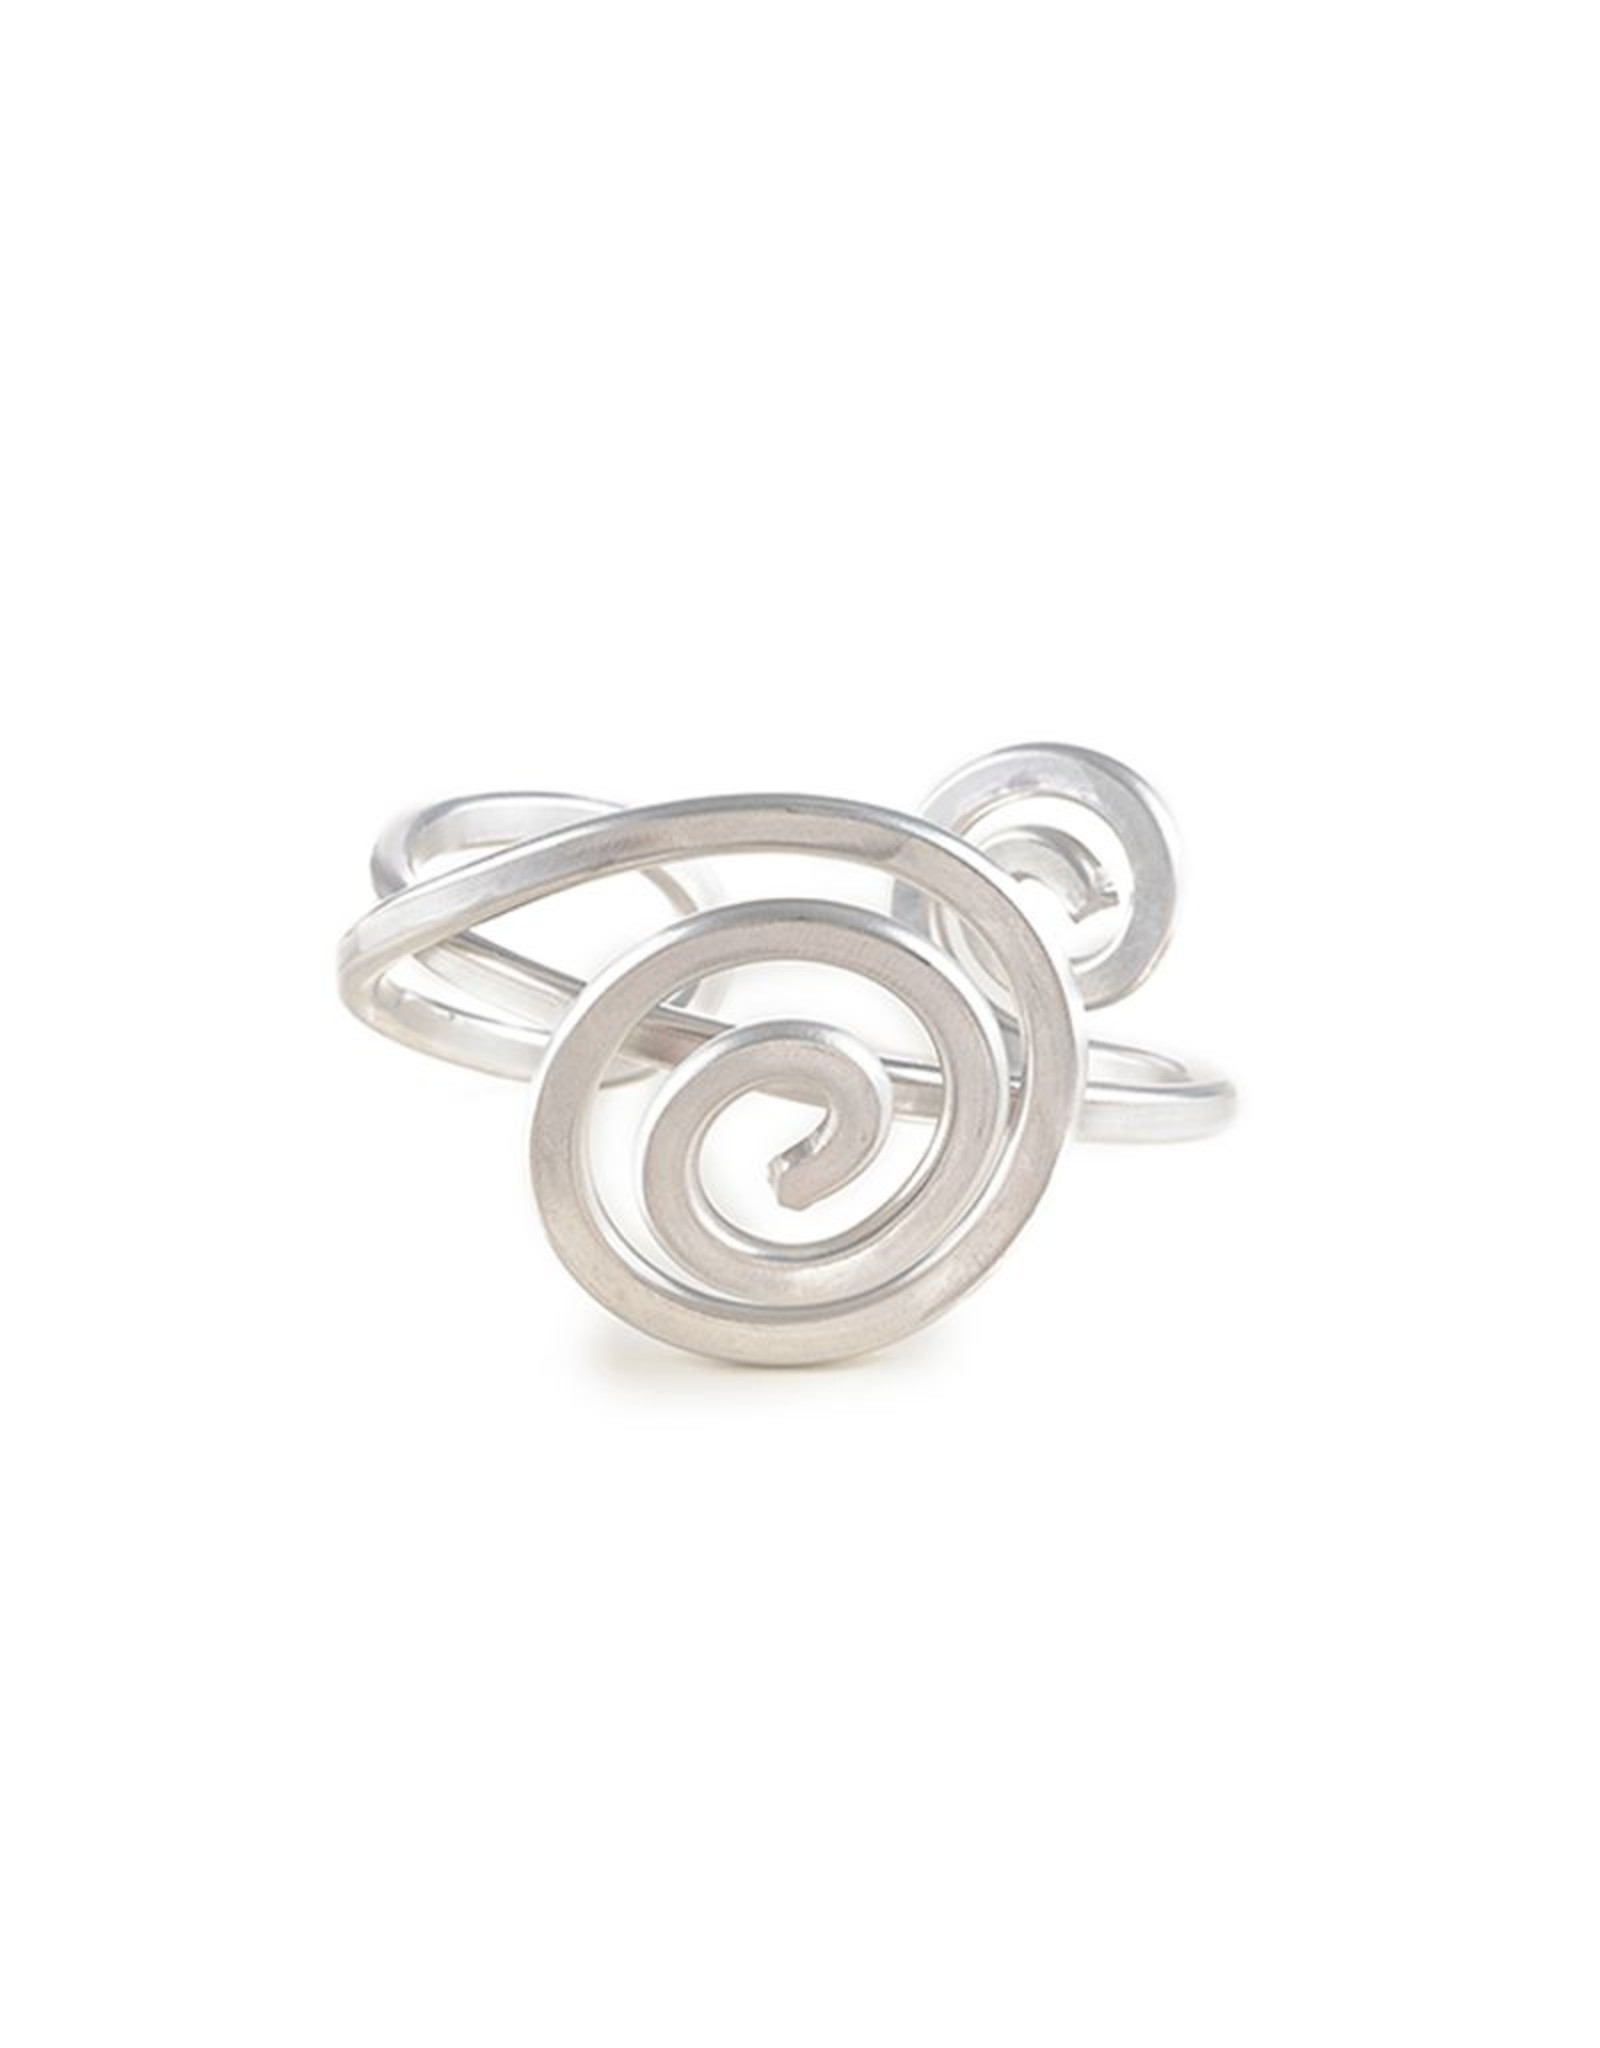 Jill Fagin Asymetrical Spiral Cuff